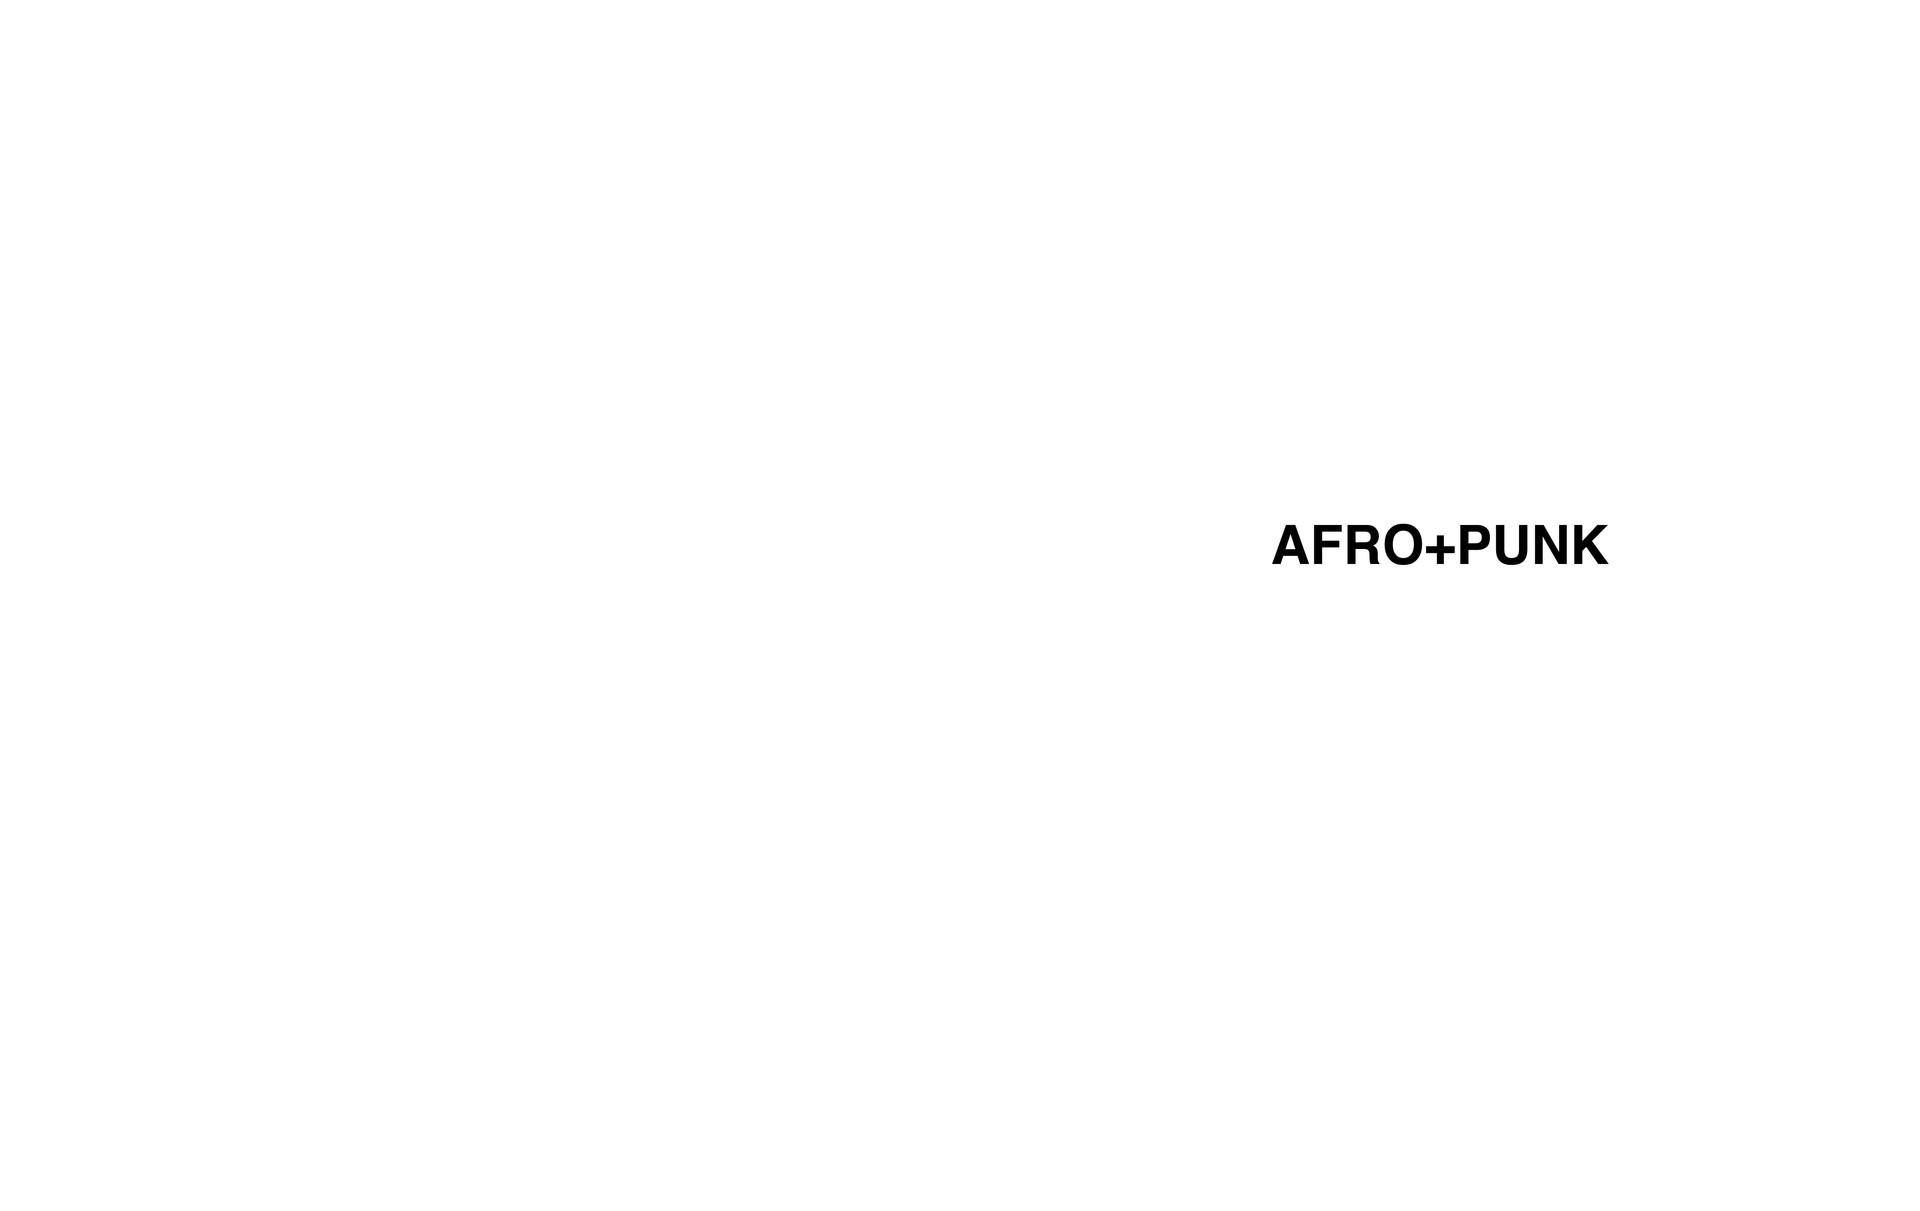 AFRO+PUNK